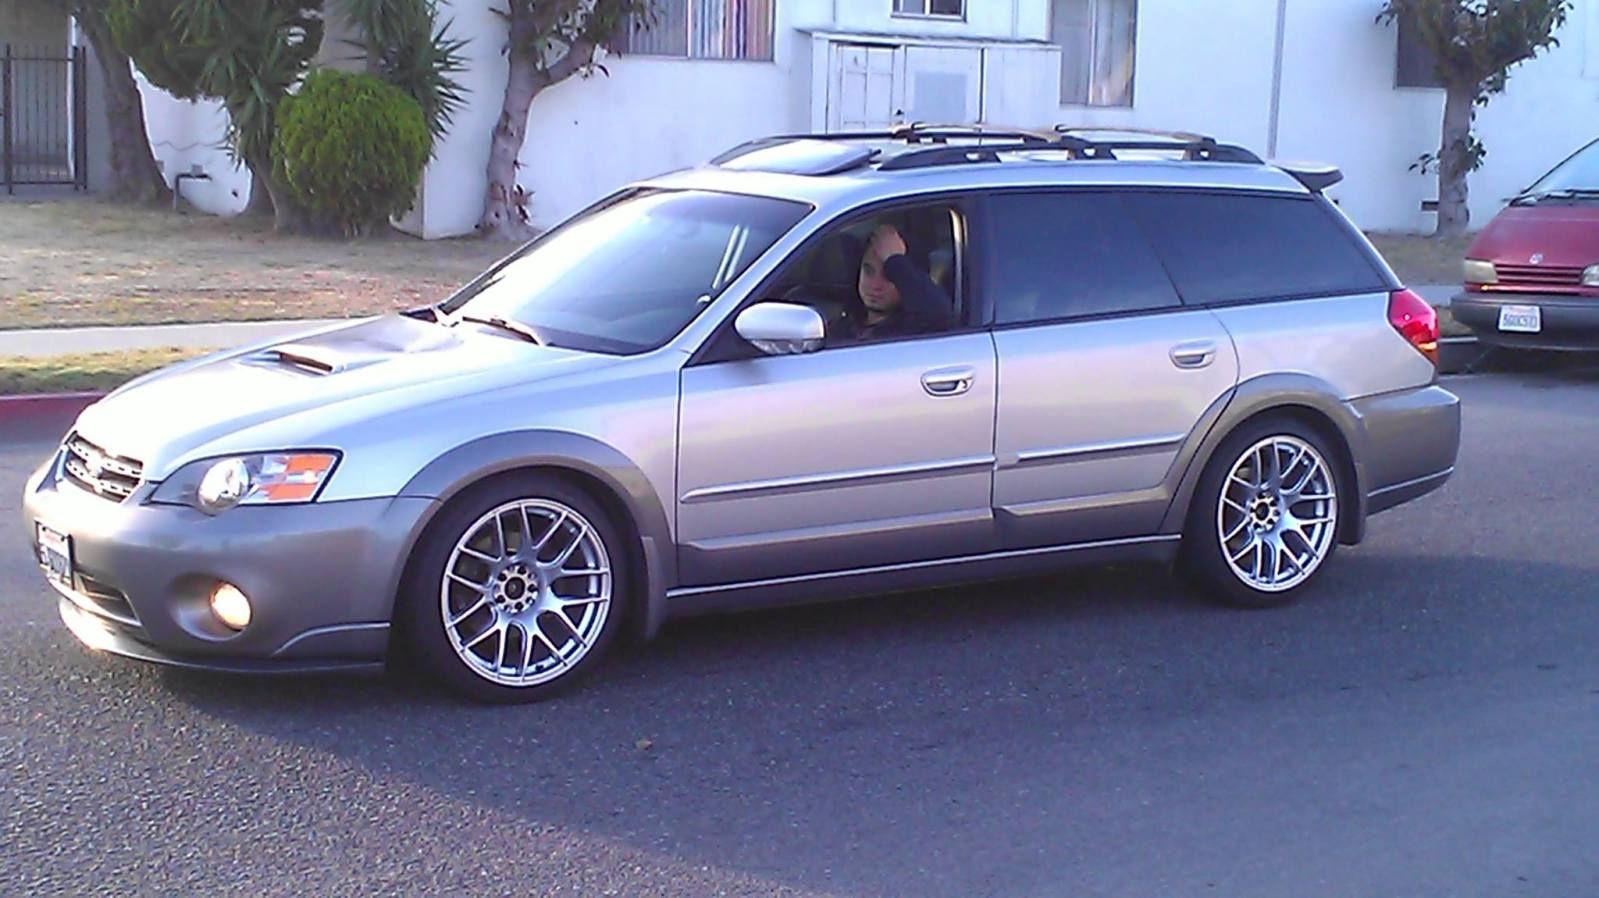 Image Result For 2013 Subaru Legacy Lowered Subaru Legacy Subaru Legacy Wagon Subaru Outback